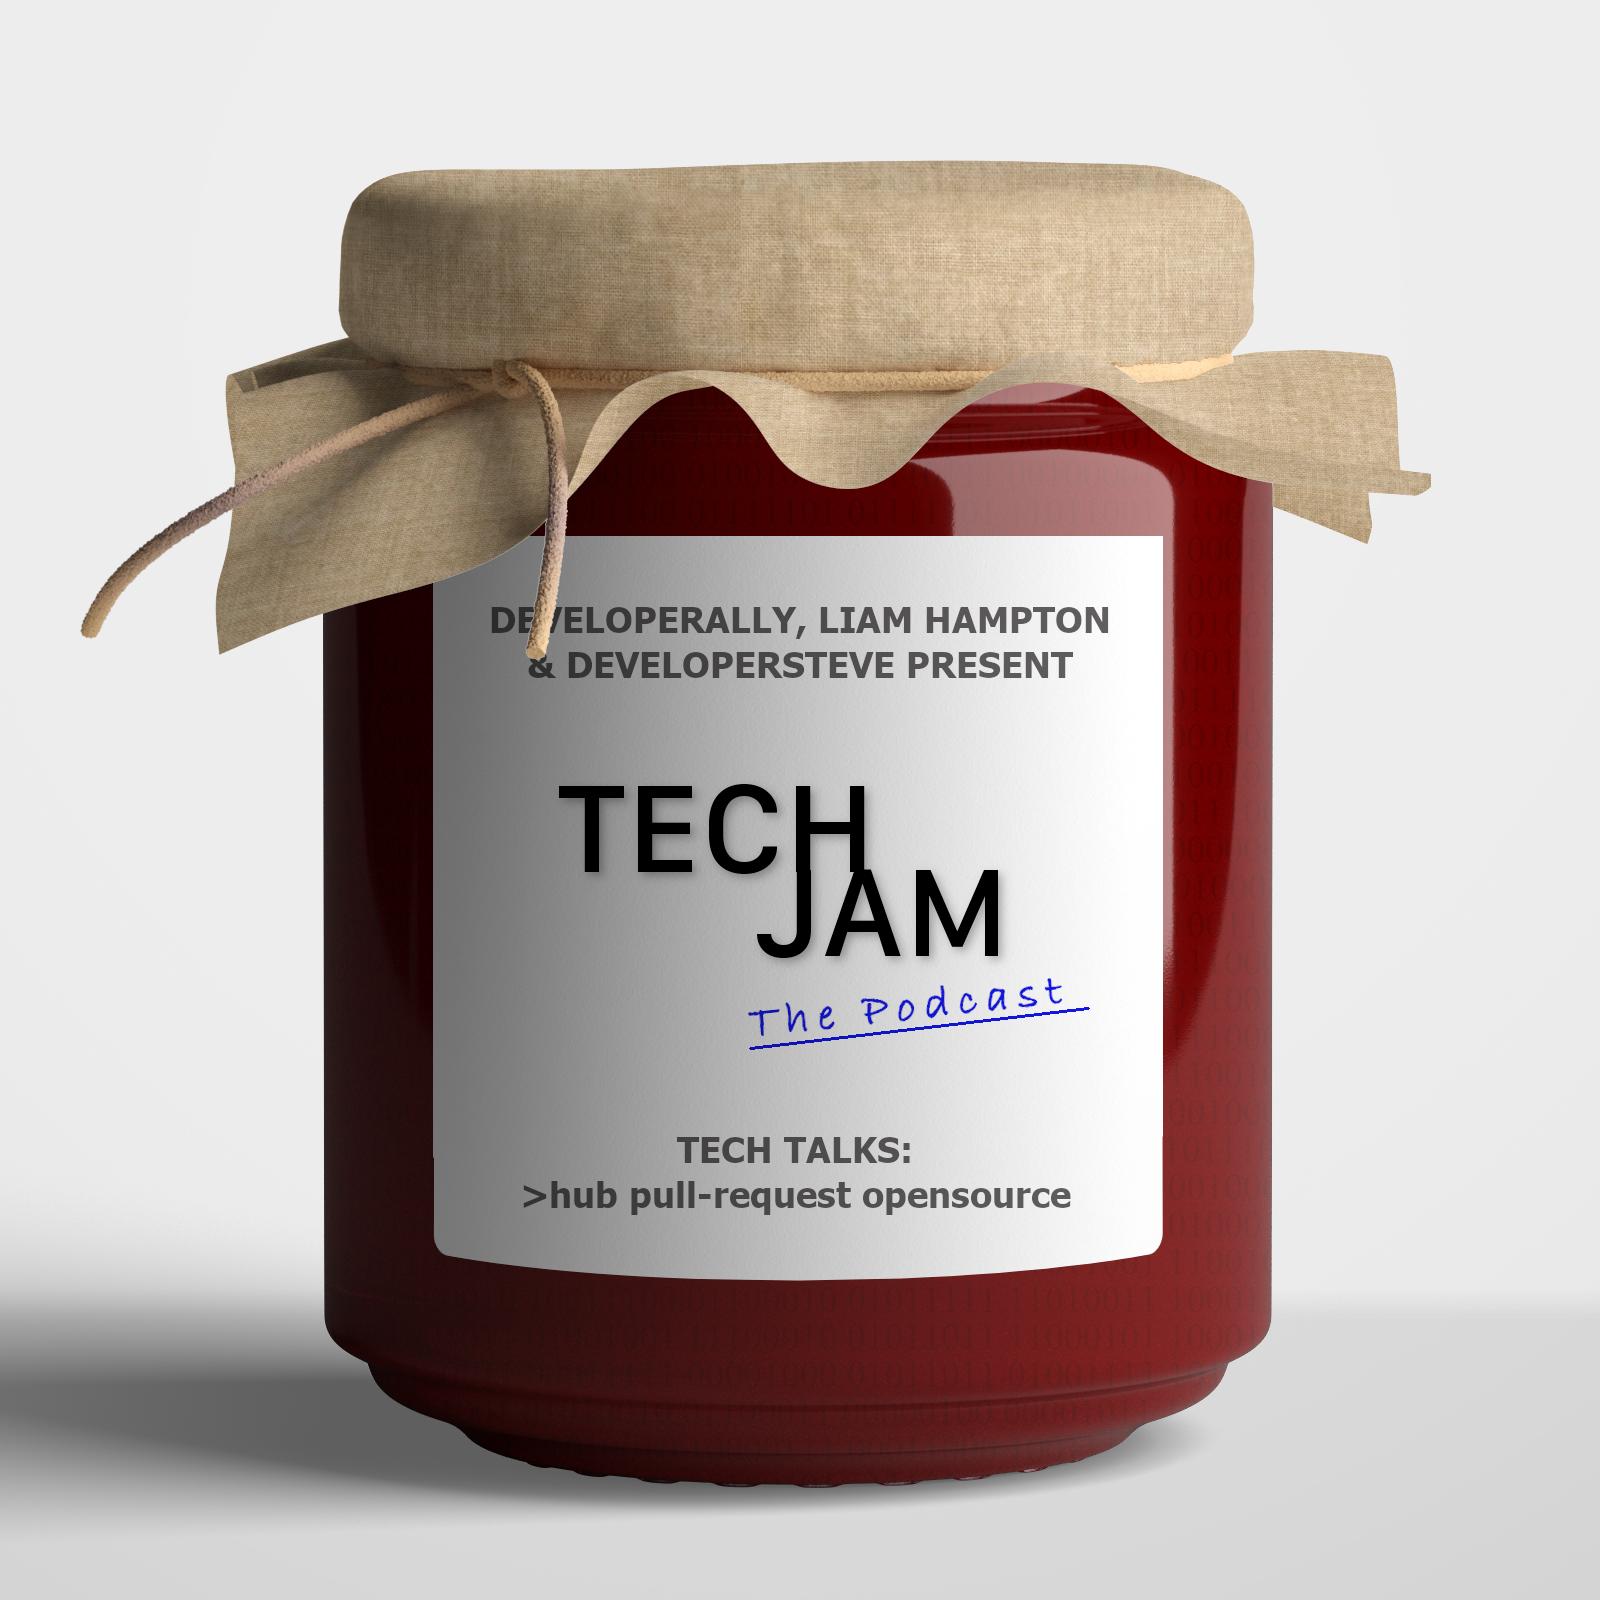 S1E3 – Hub pull-request opensource